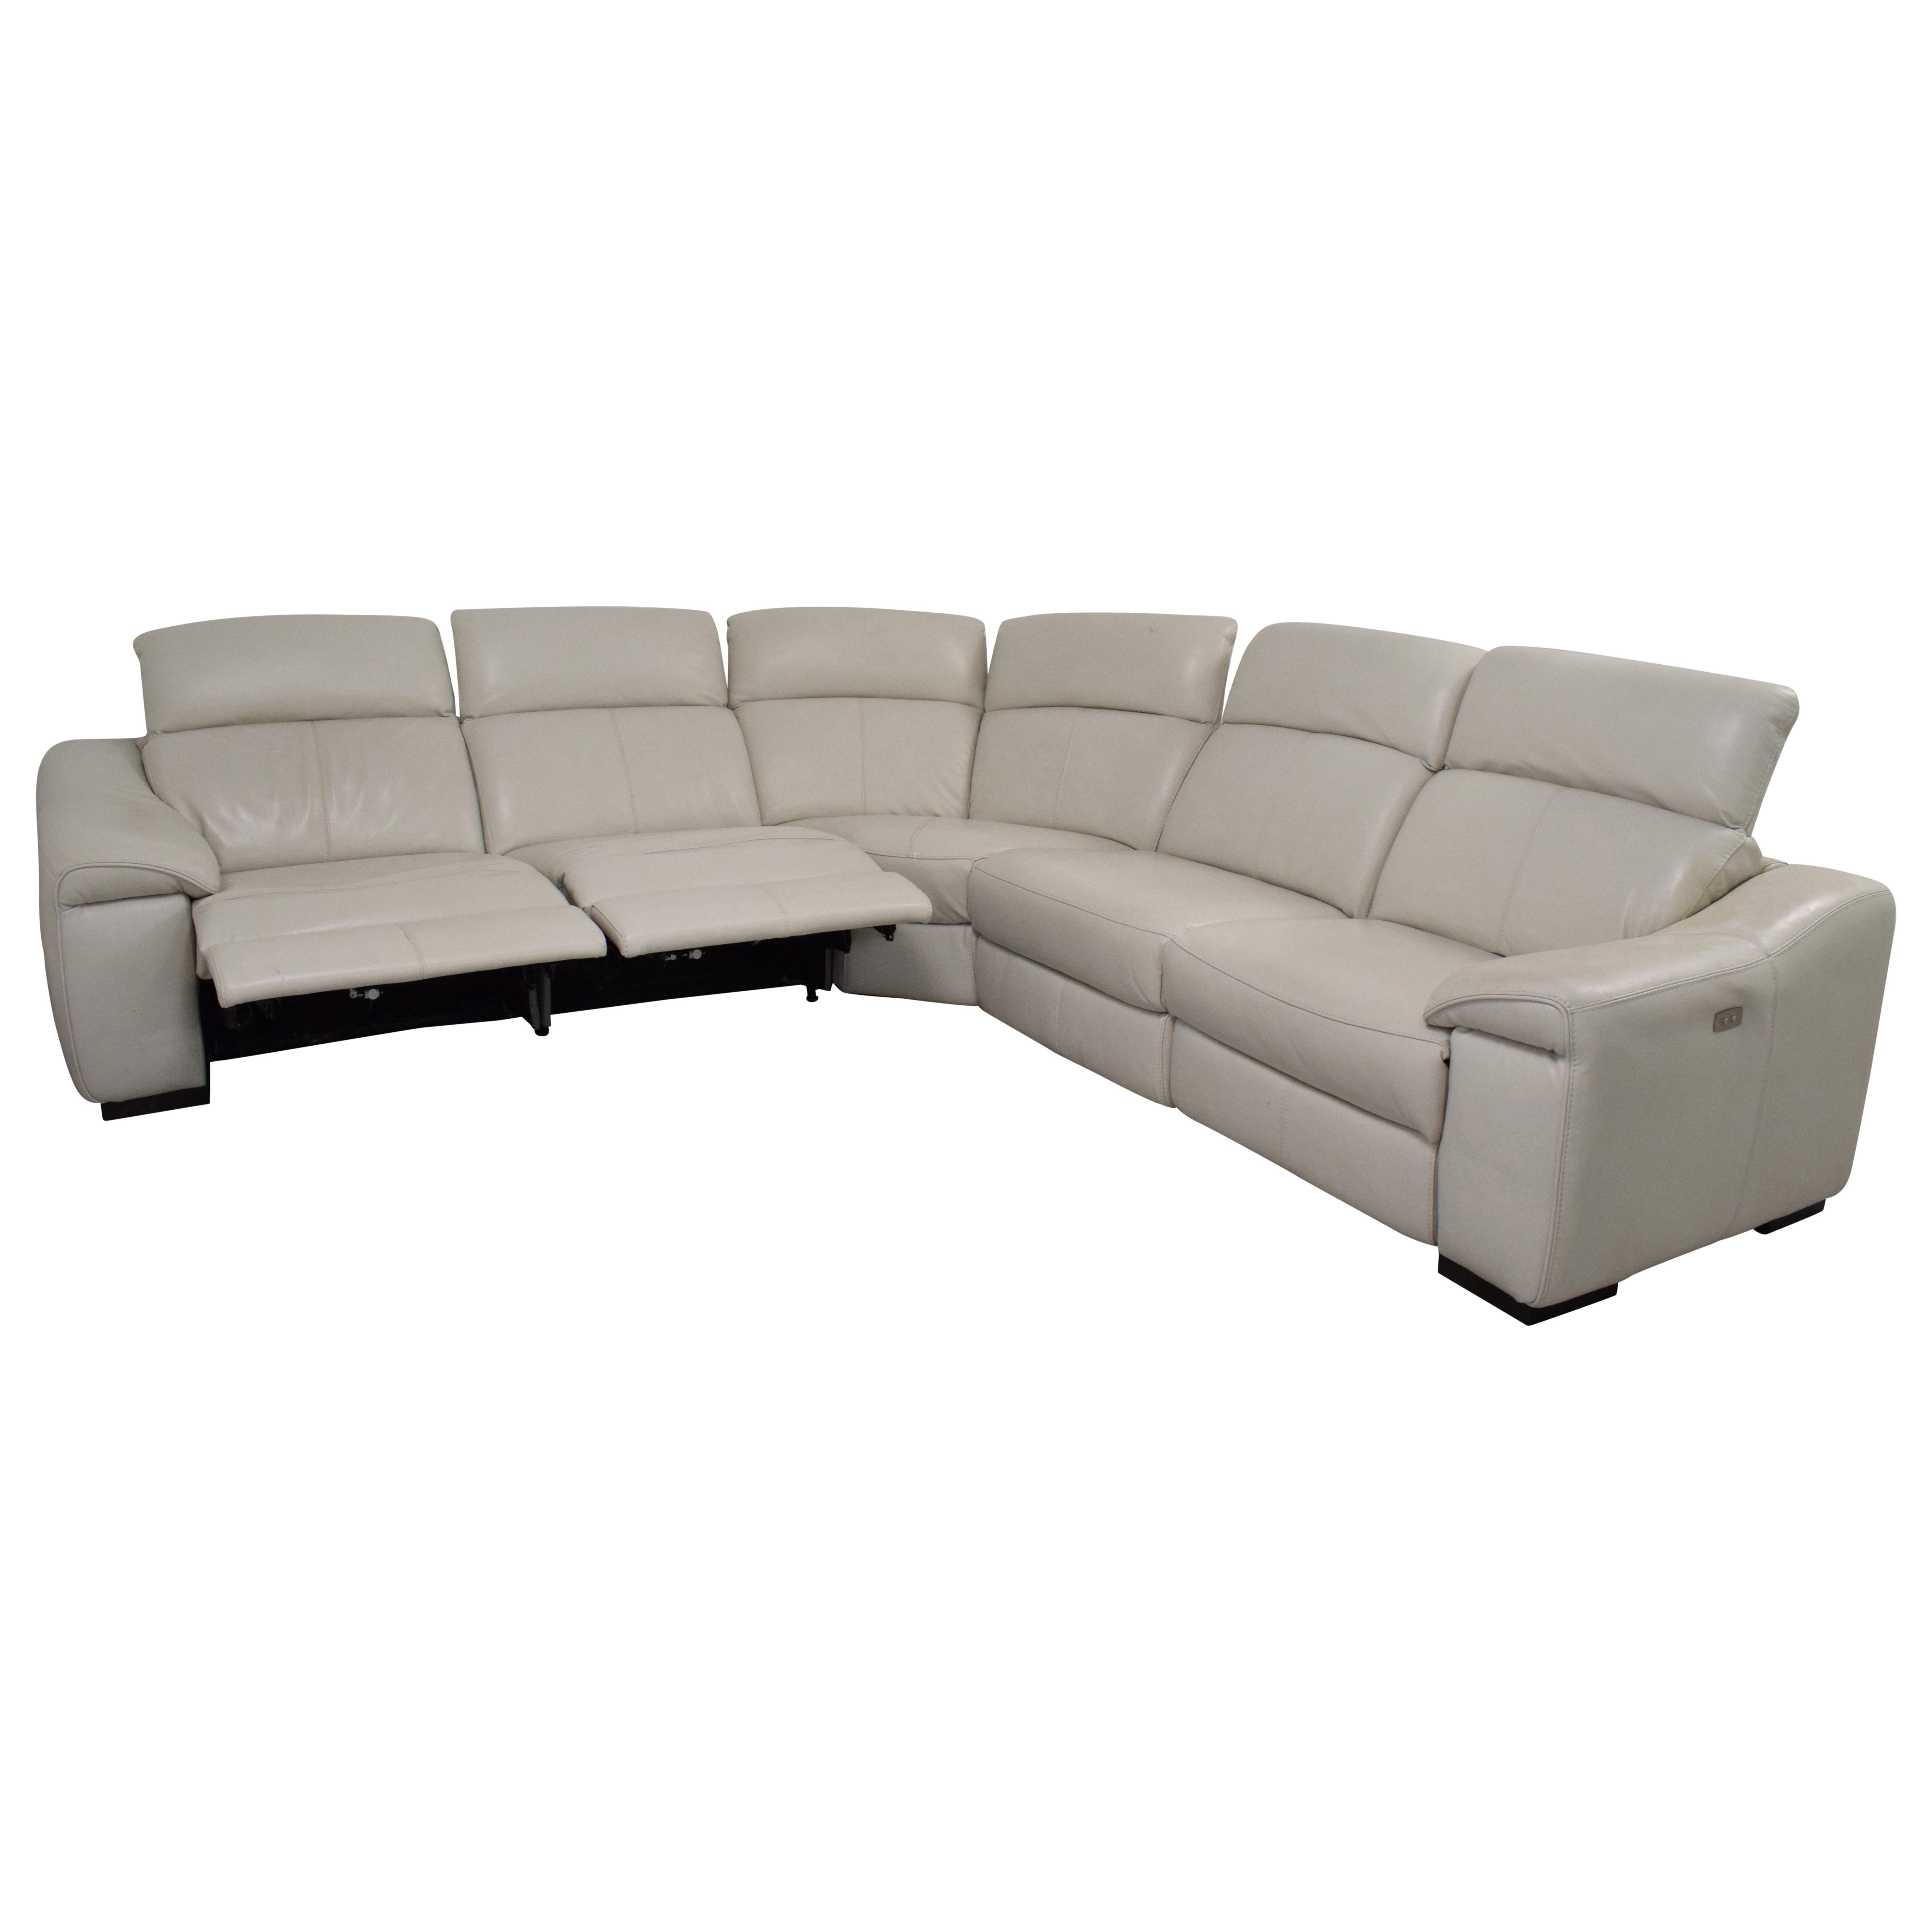 Macy's Macy's Power Reclining Sectional Sofa Sofas